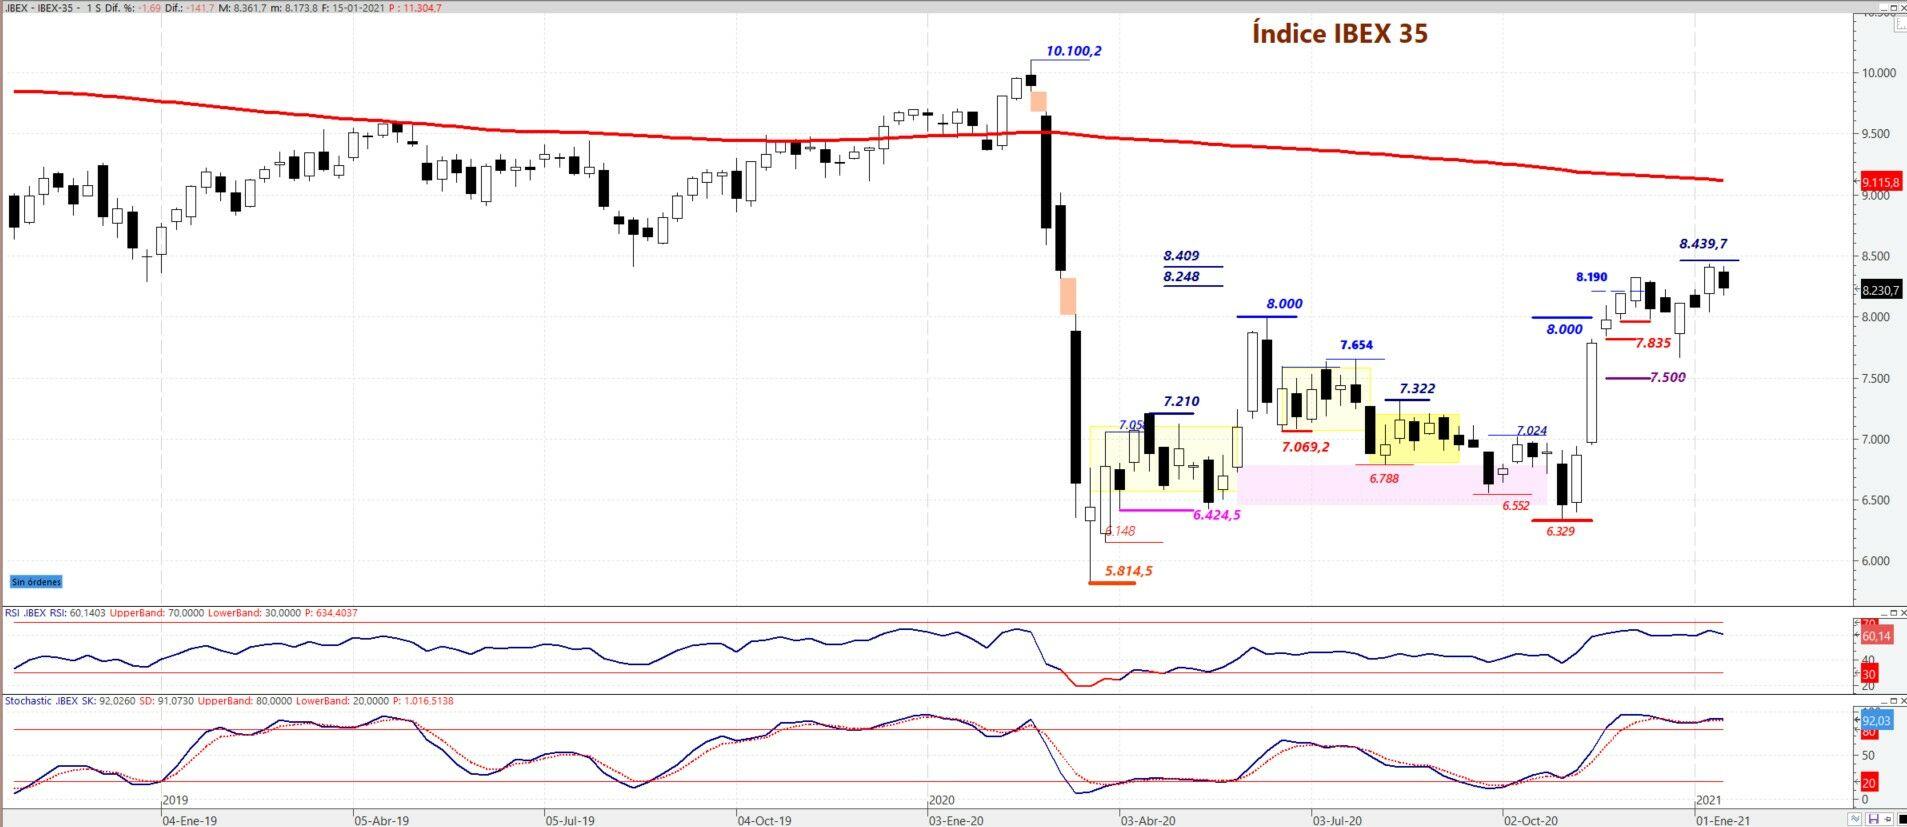 Ibex 35 gráfico semanal